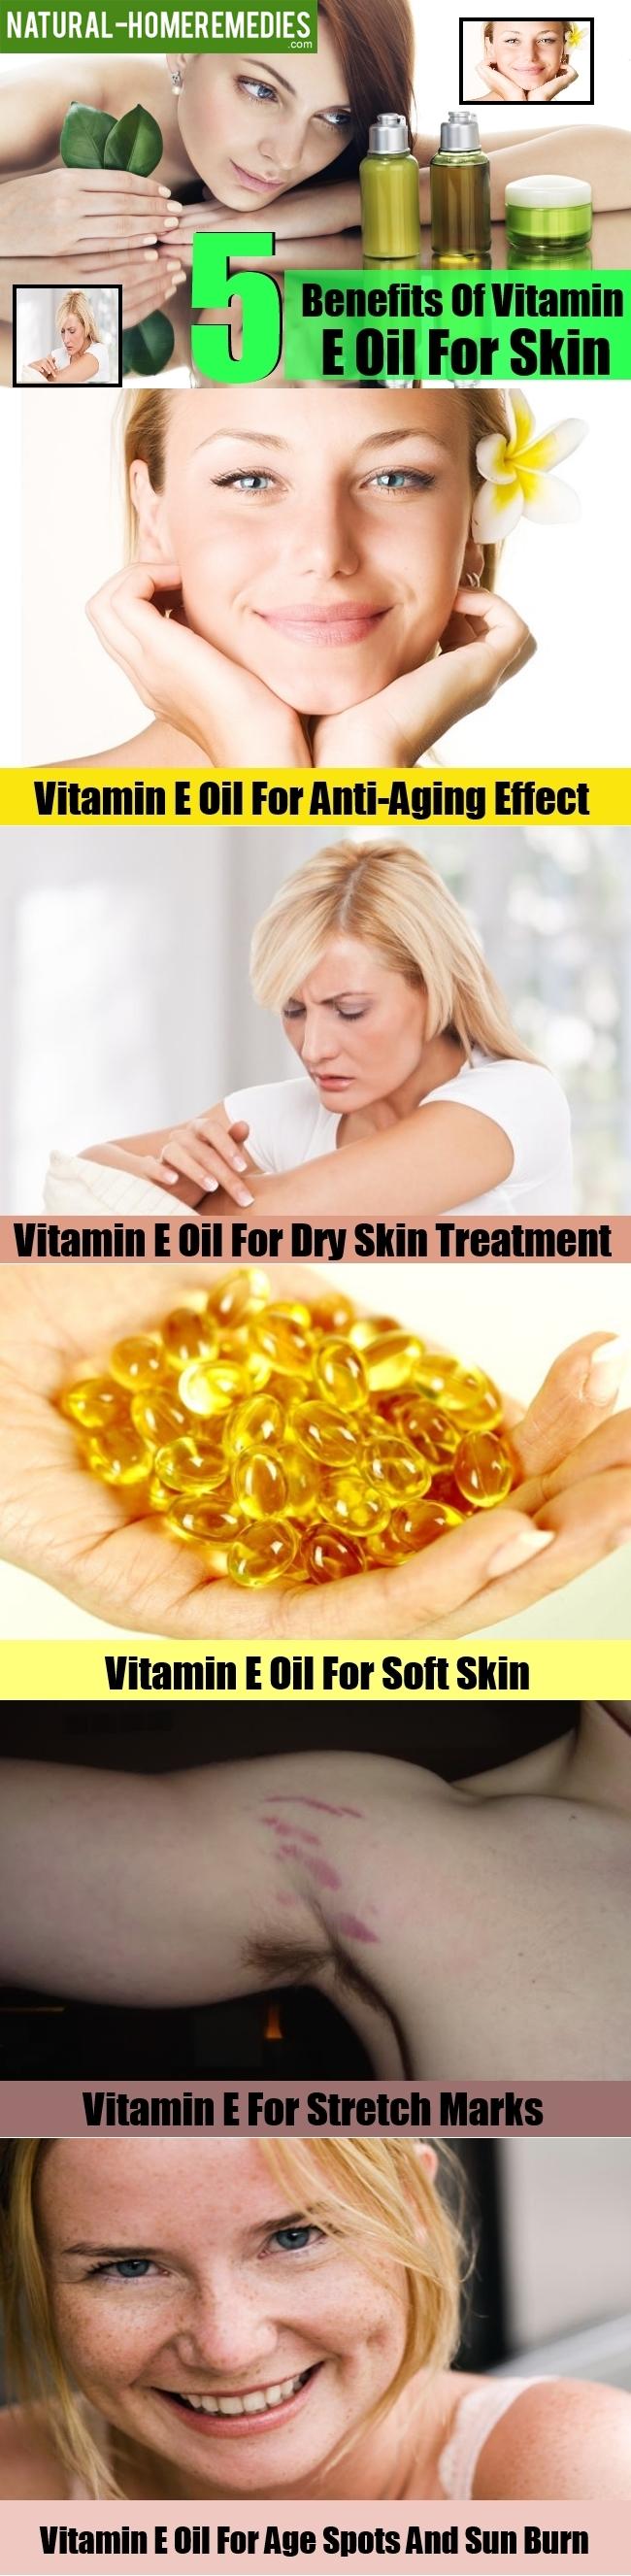 5 Benefits Of Vitamin E Oil For Skin